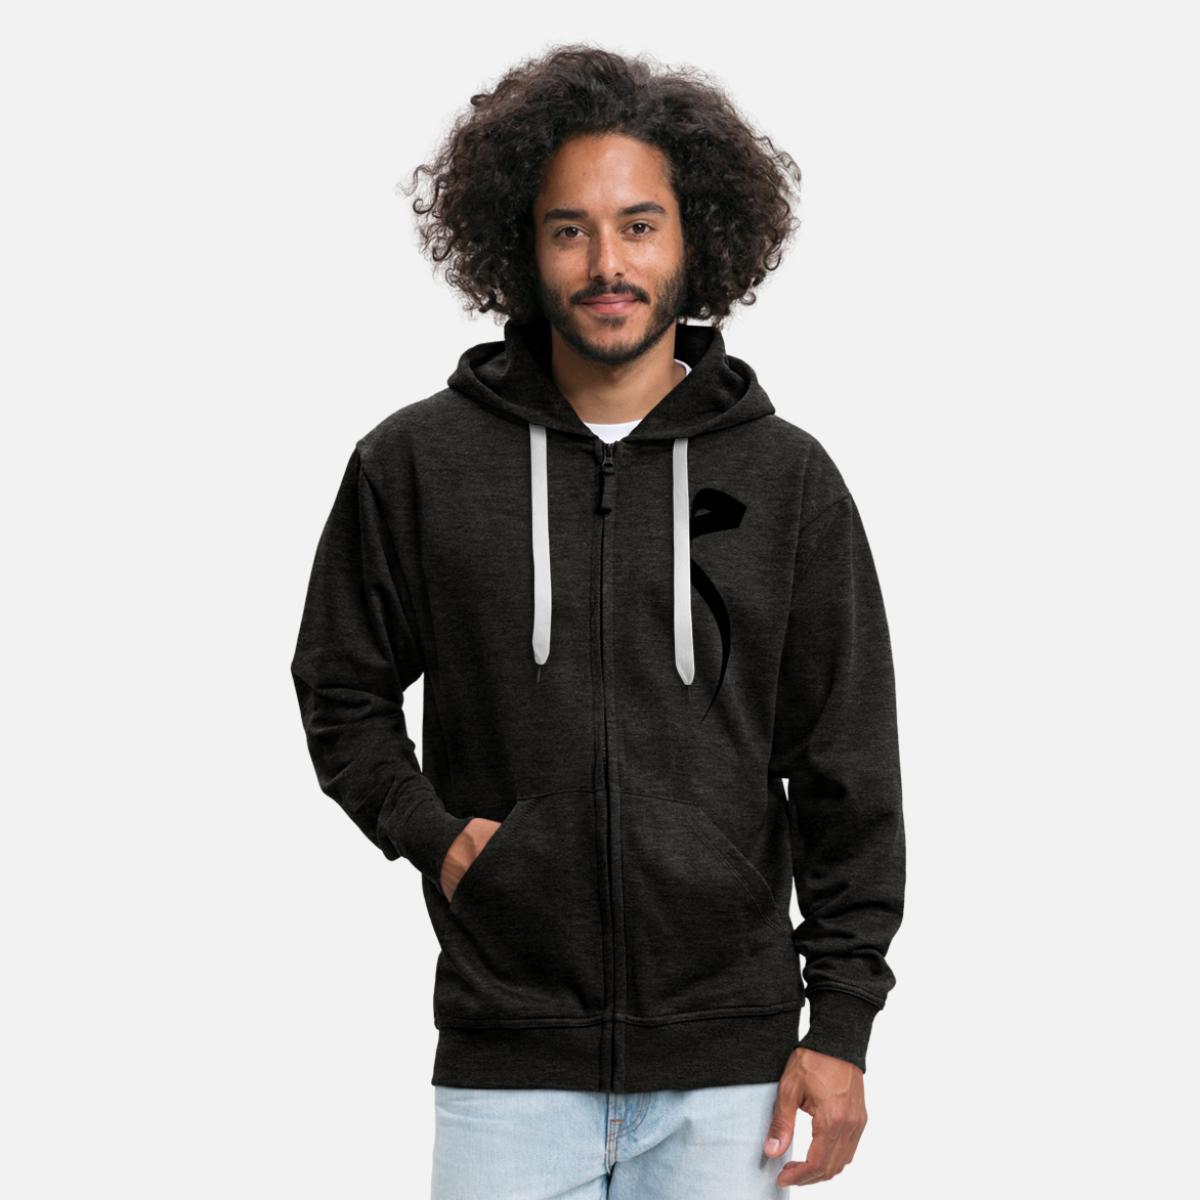 Couples Swan Mens Big /& Tall Full Zip Hooded Sweatshirt Top for Mans Boys